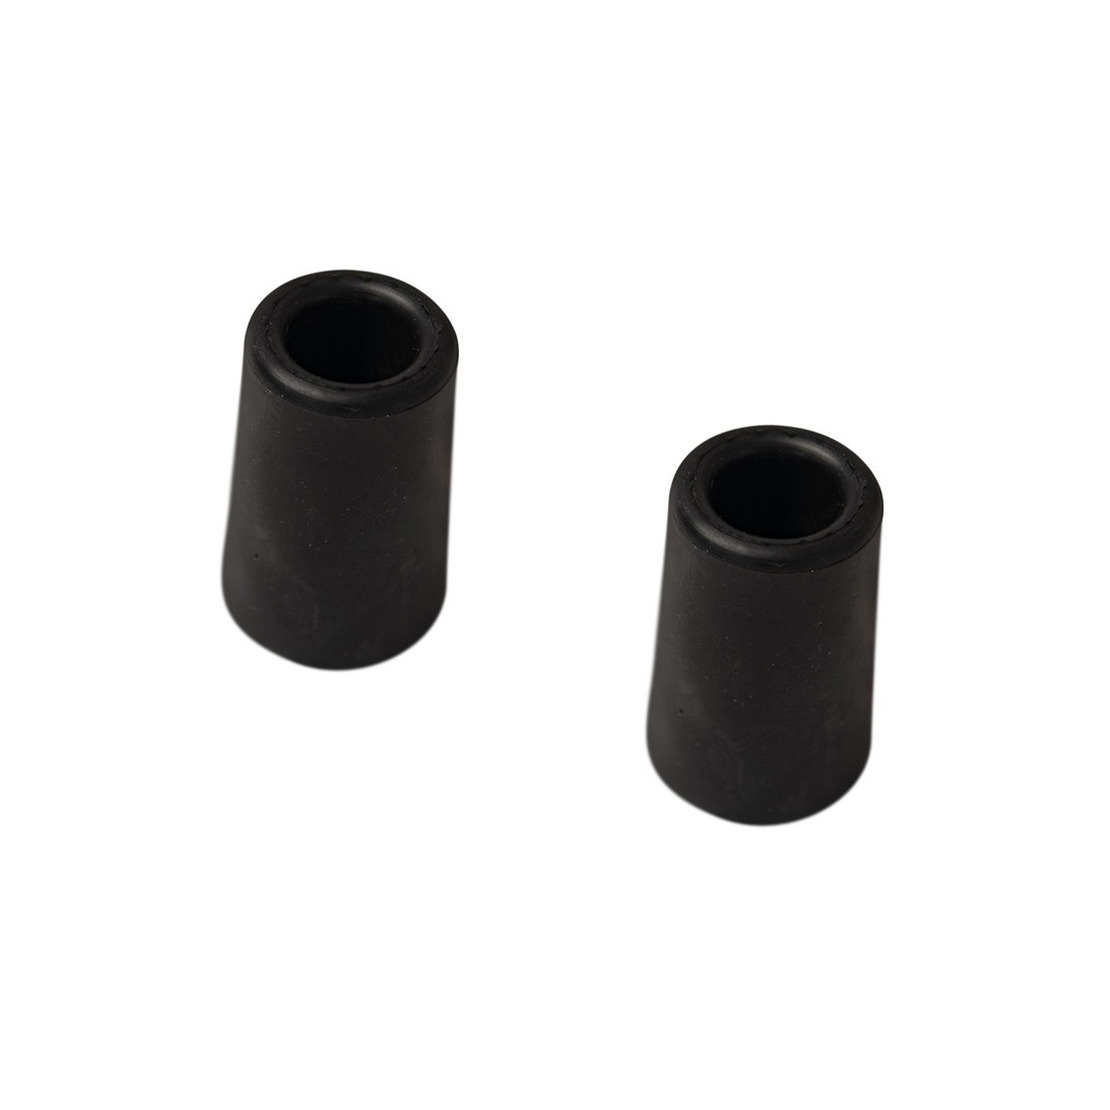 5x stuks deurstopper - deurbuffer rubber zwart 60 mm